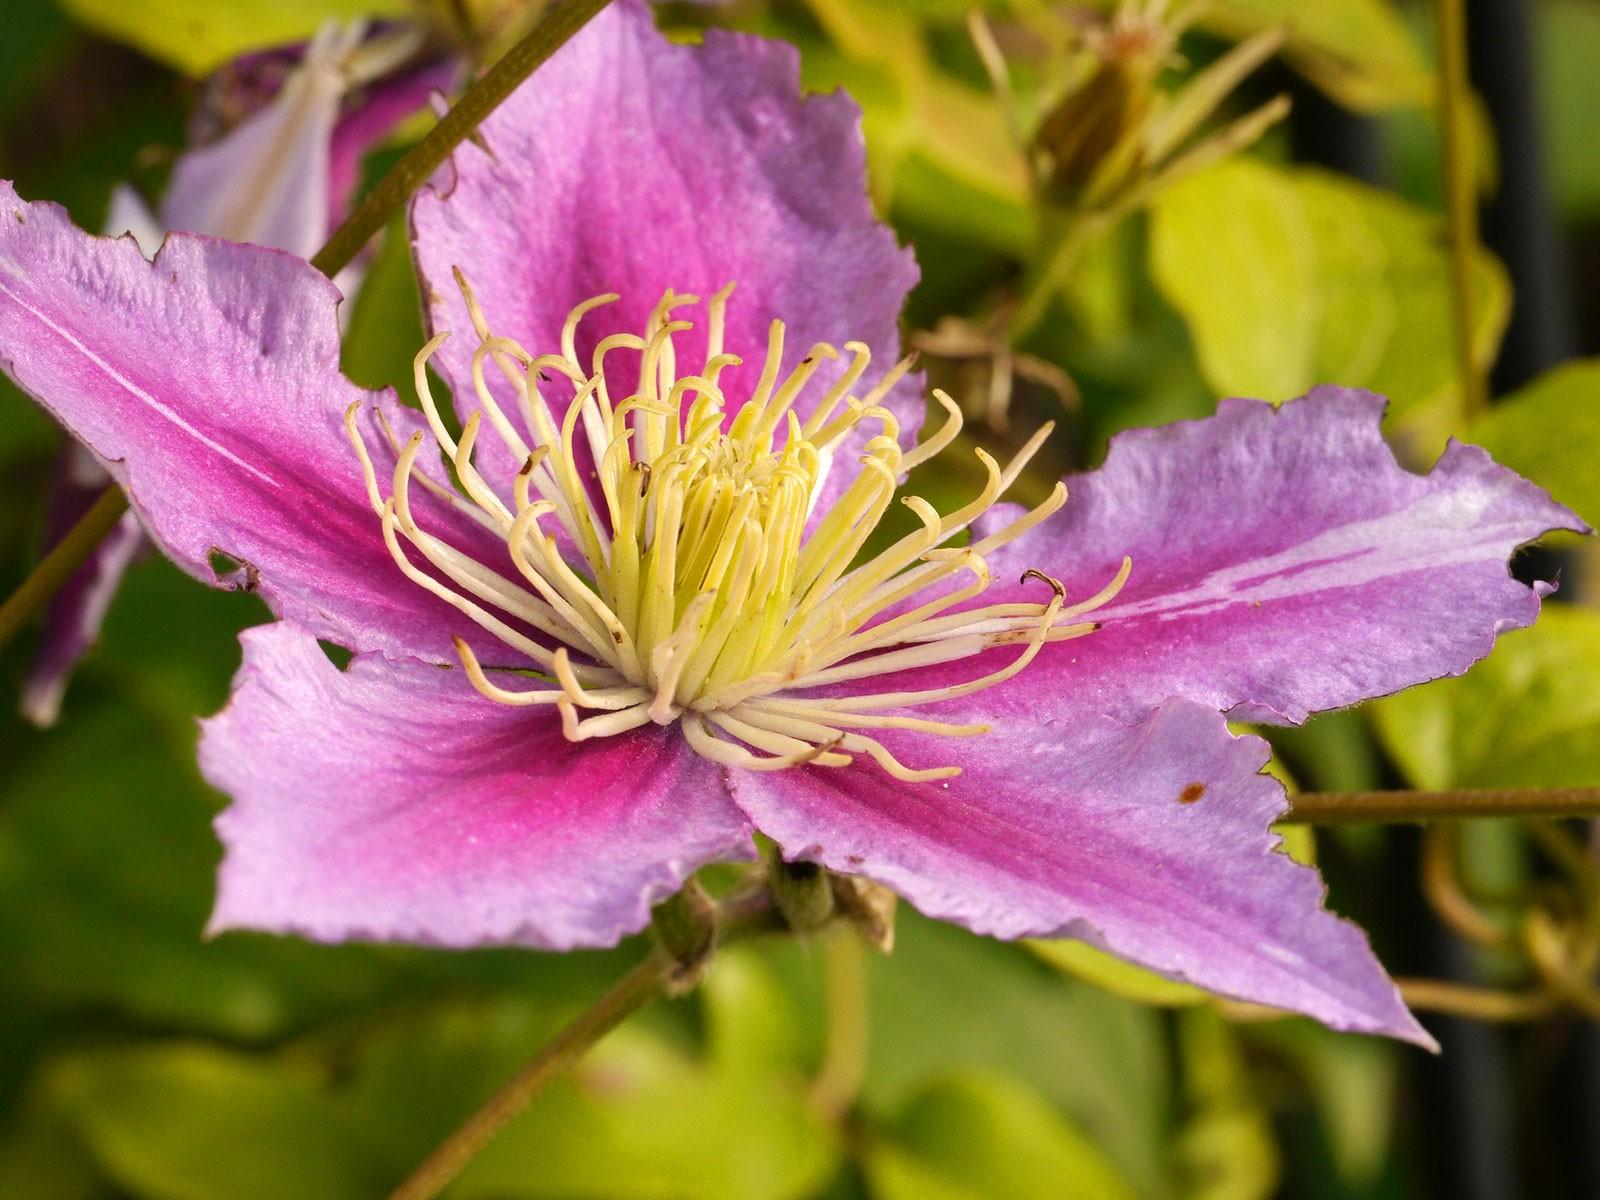 culture des cl matites racines l 39 ombre fleurs au soleil blog jardin. Black Bedroom Furniture Sets. Home Design Ideas